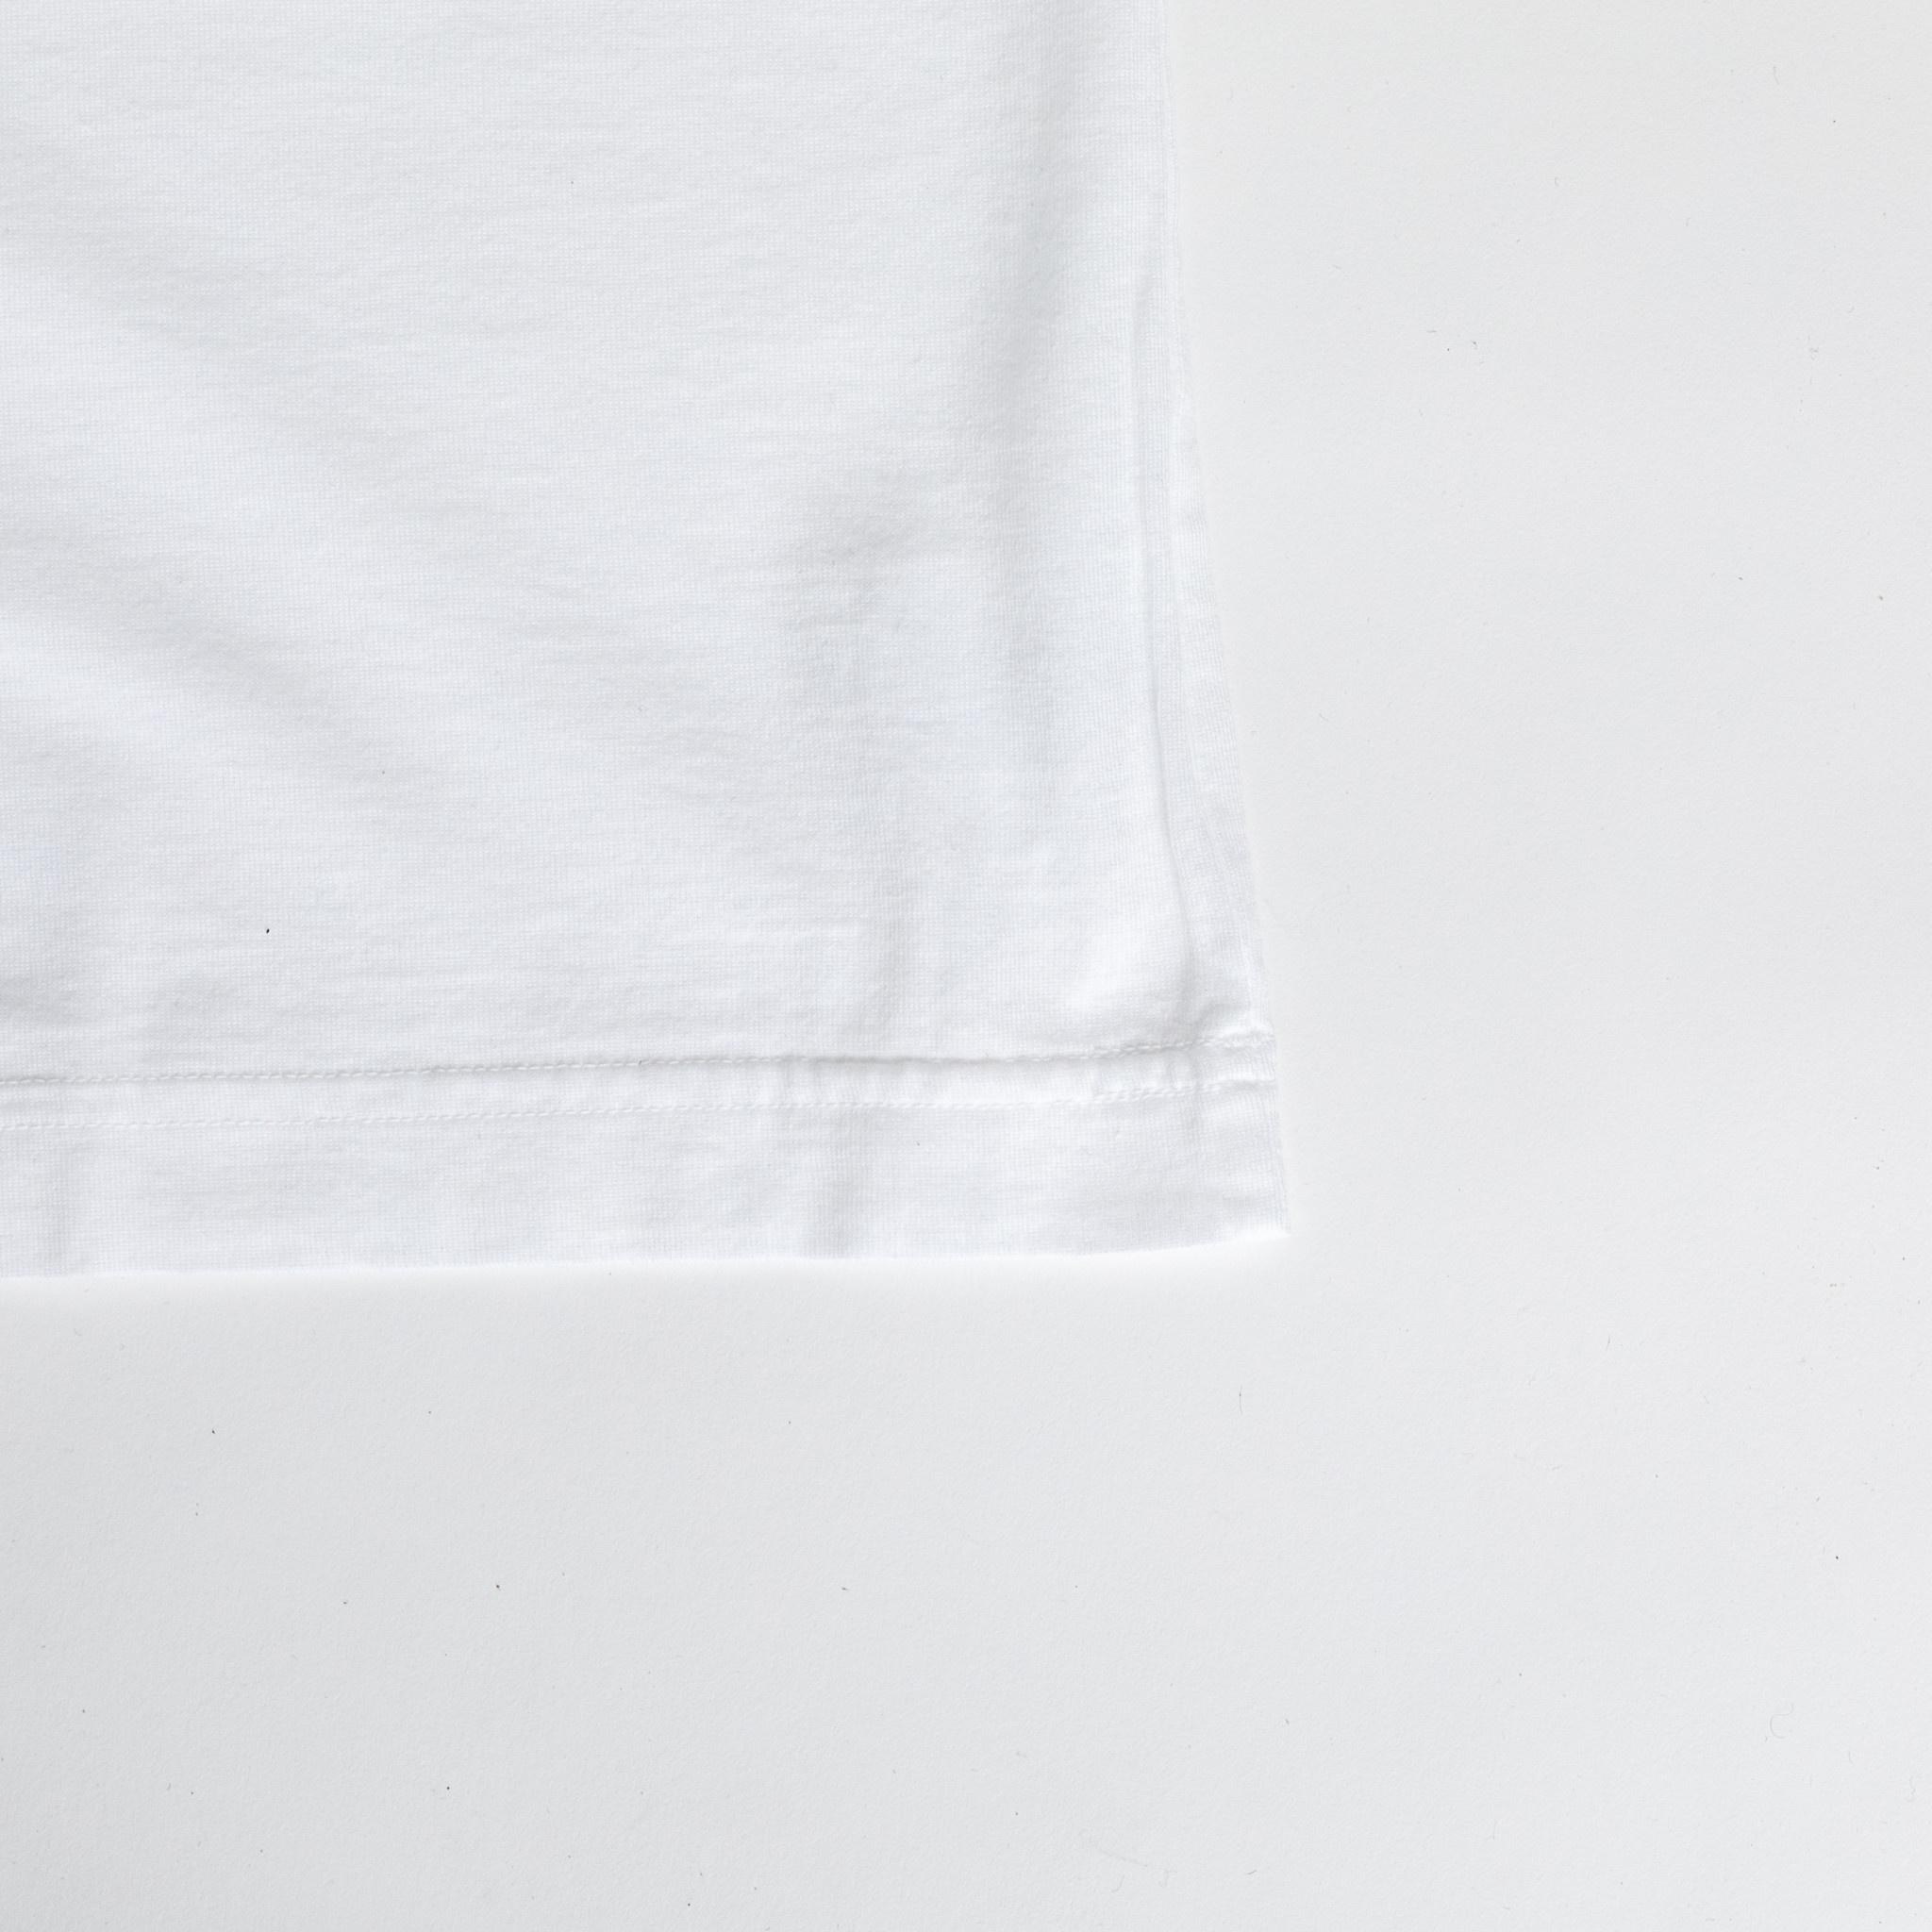 IITO IITO - Unisex T-shirt, Pure Breeze ®, SMIT-006